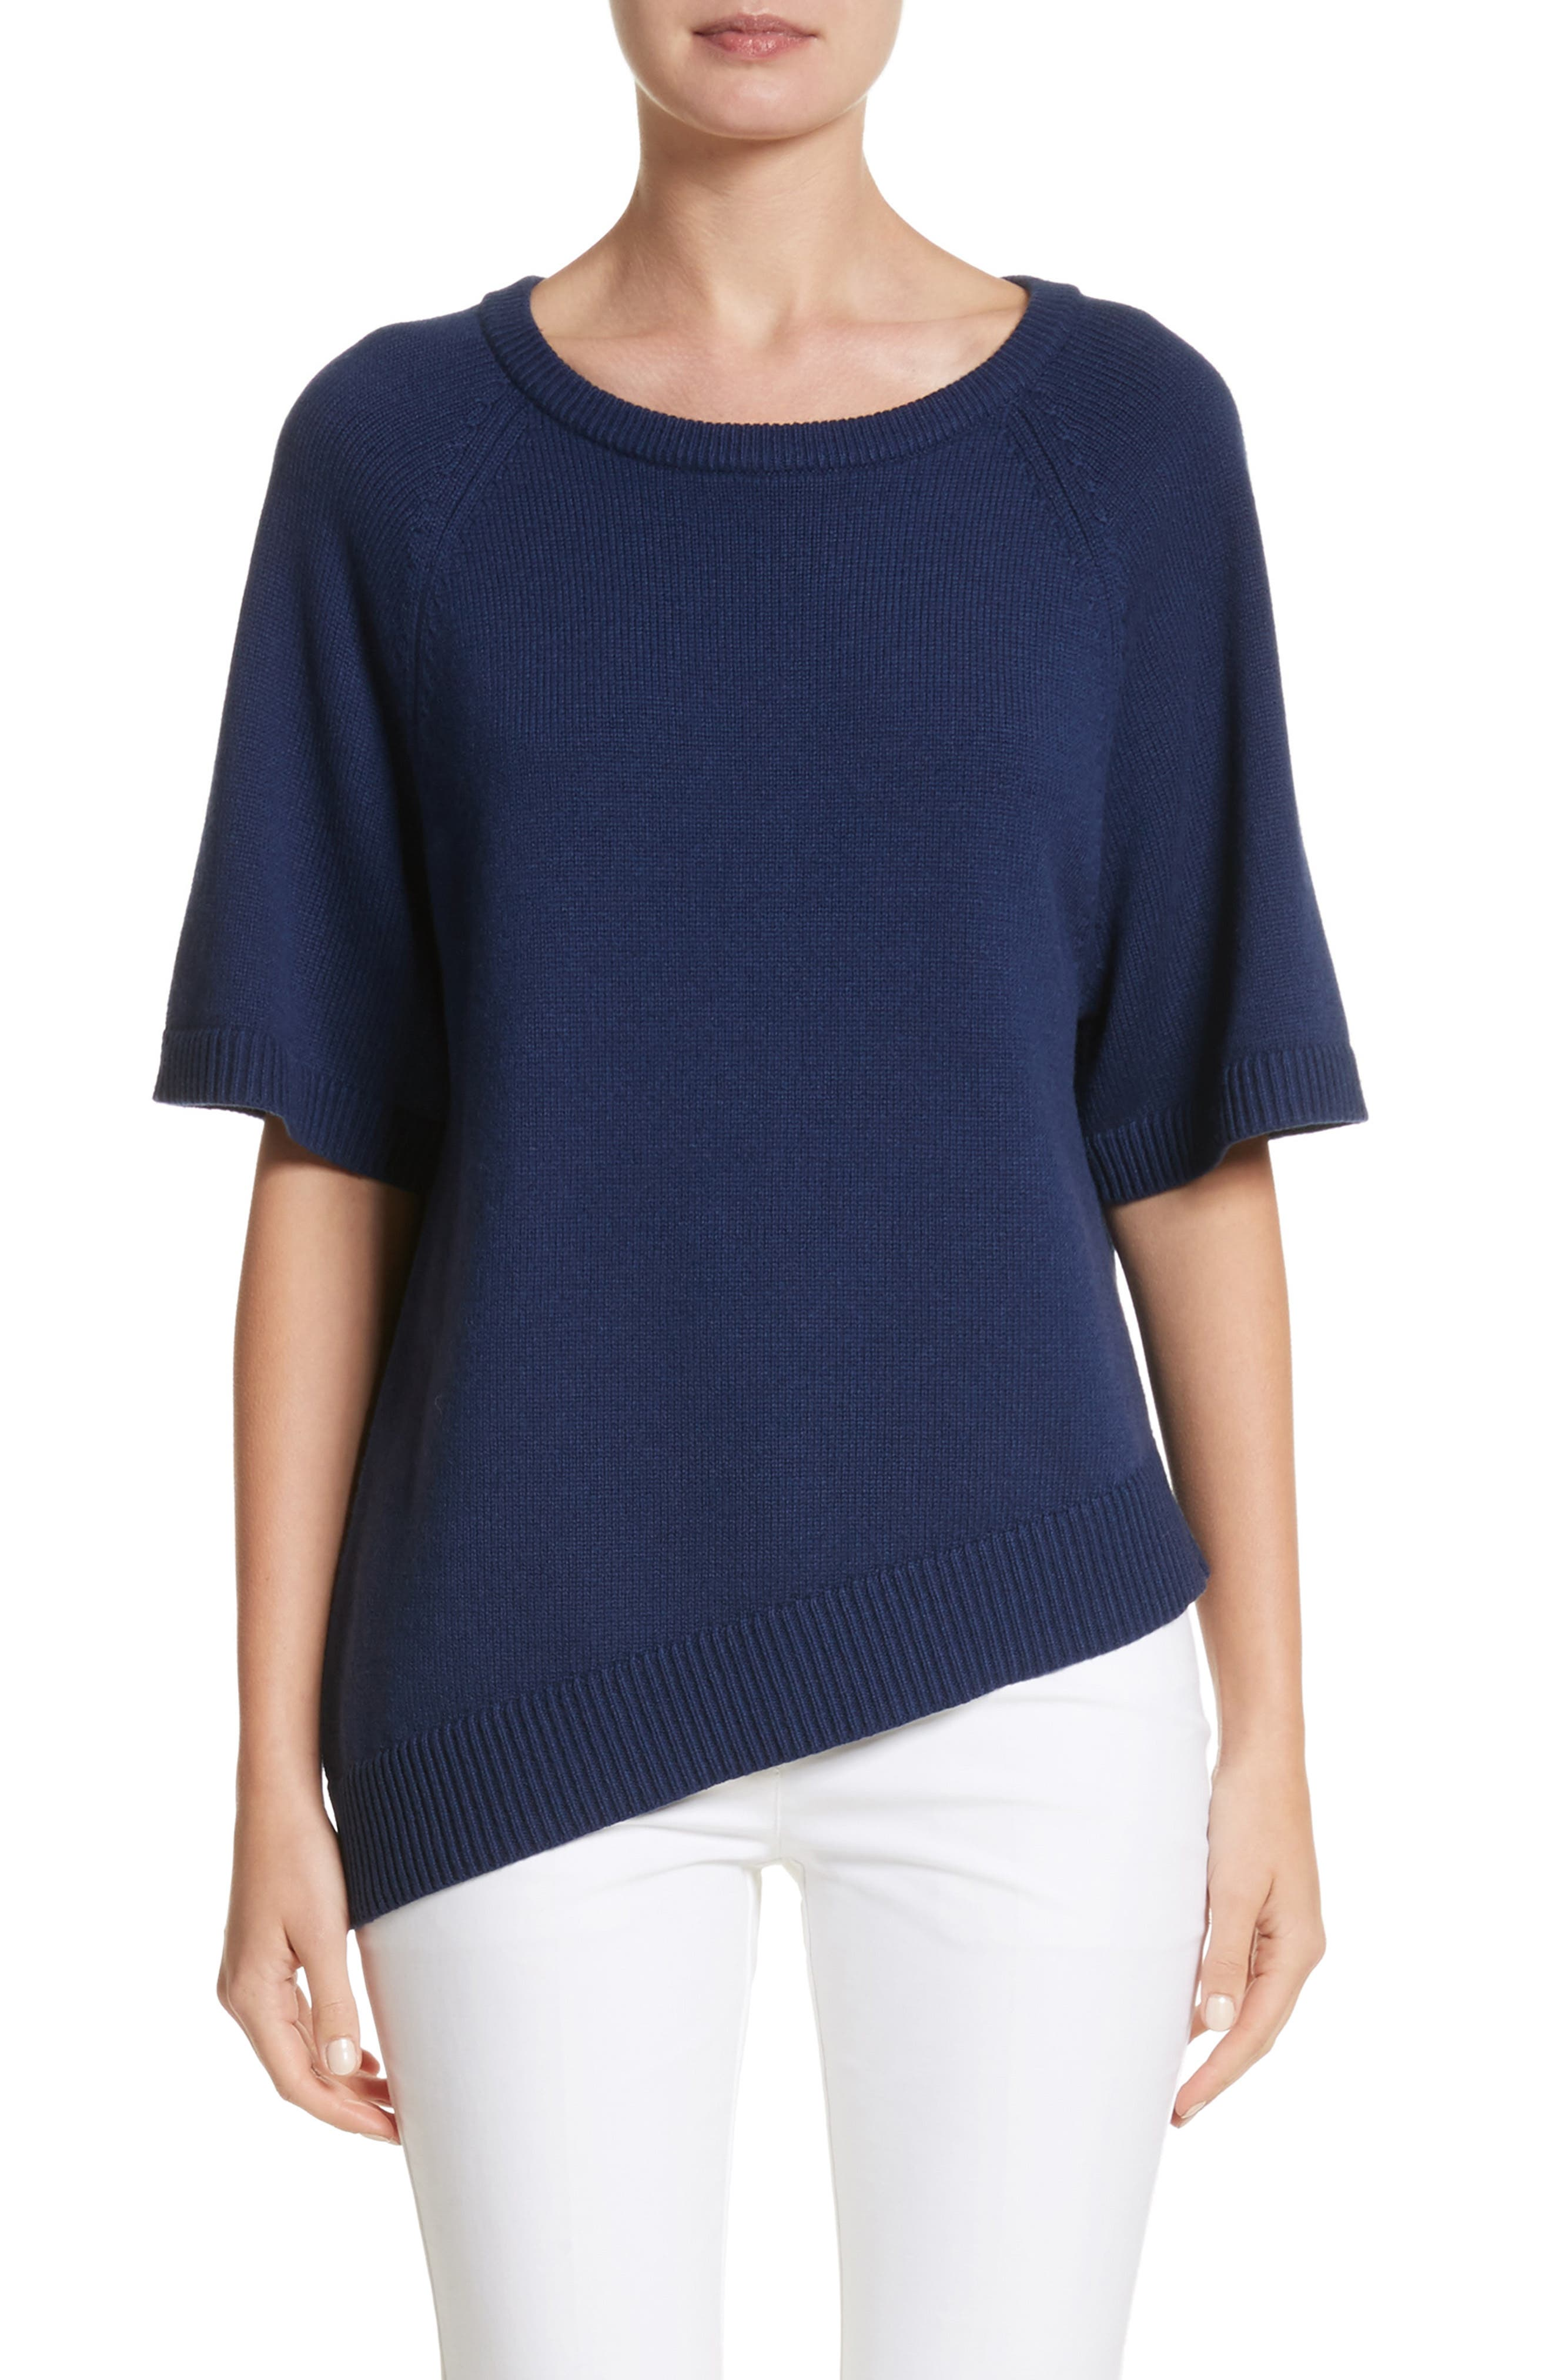 Main Image - Michael Kors Asymmetrical Cashmere Pullover